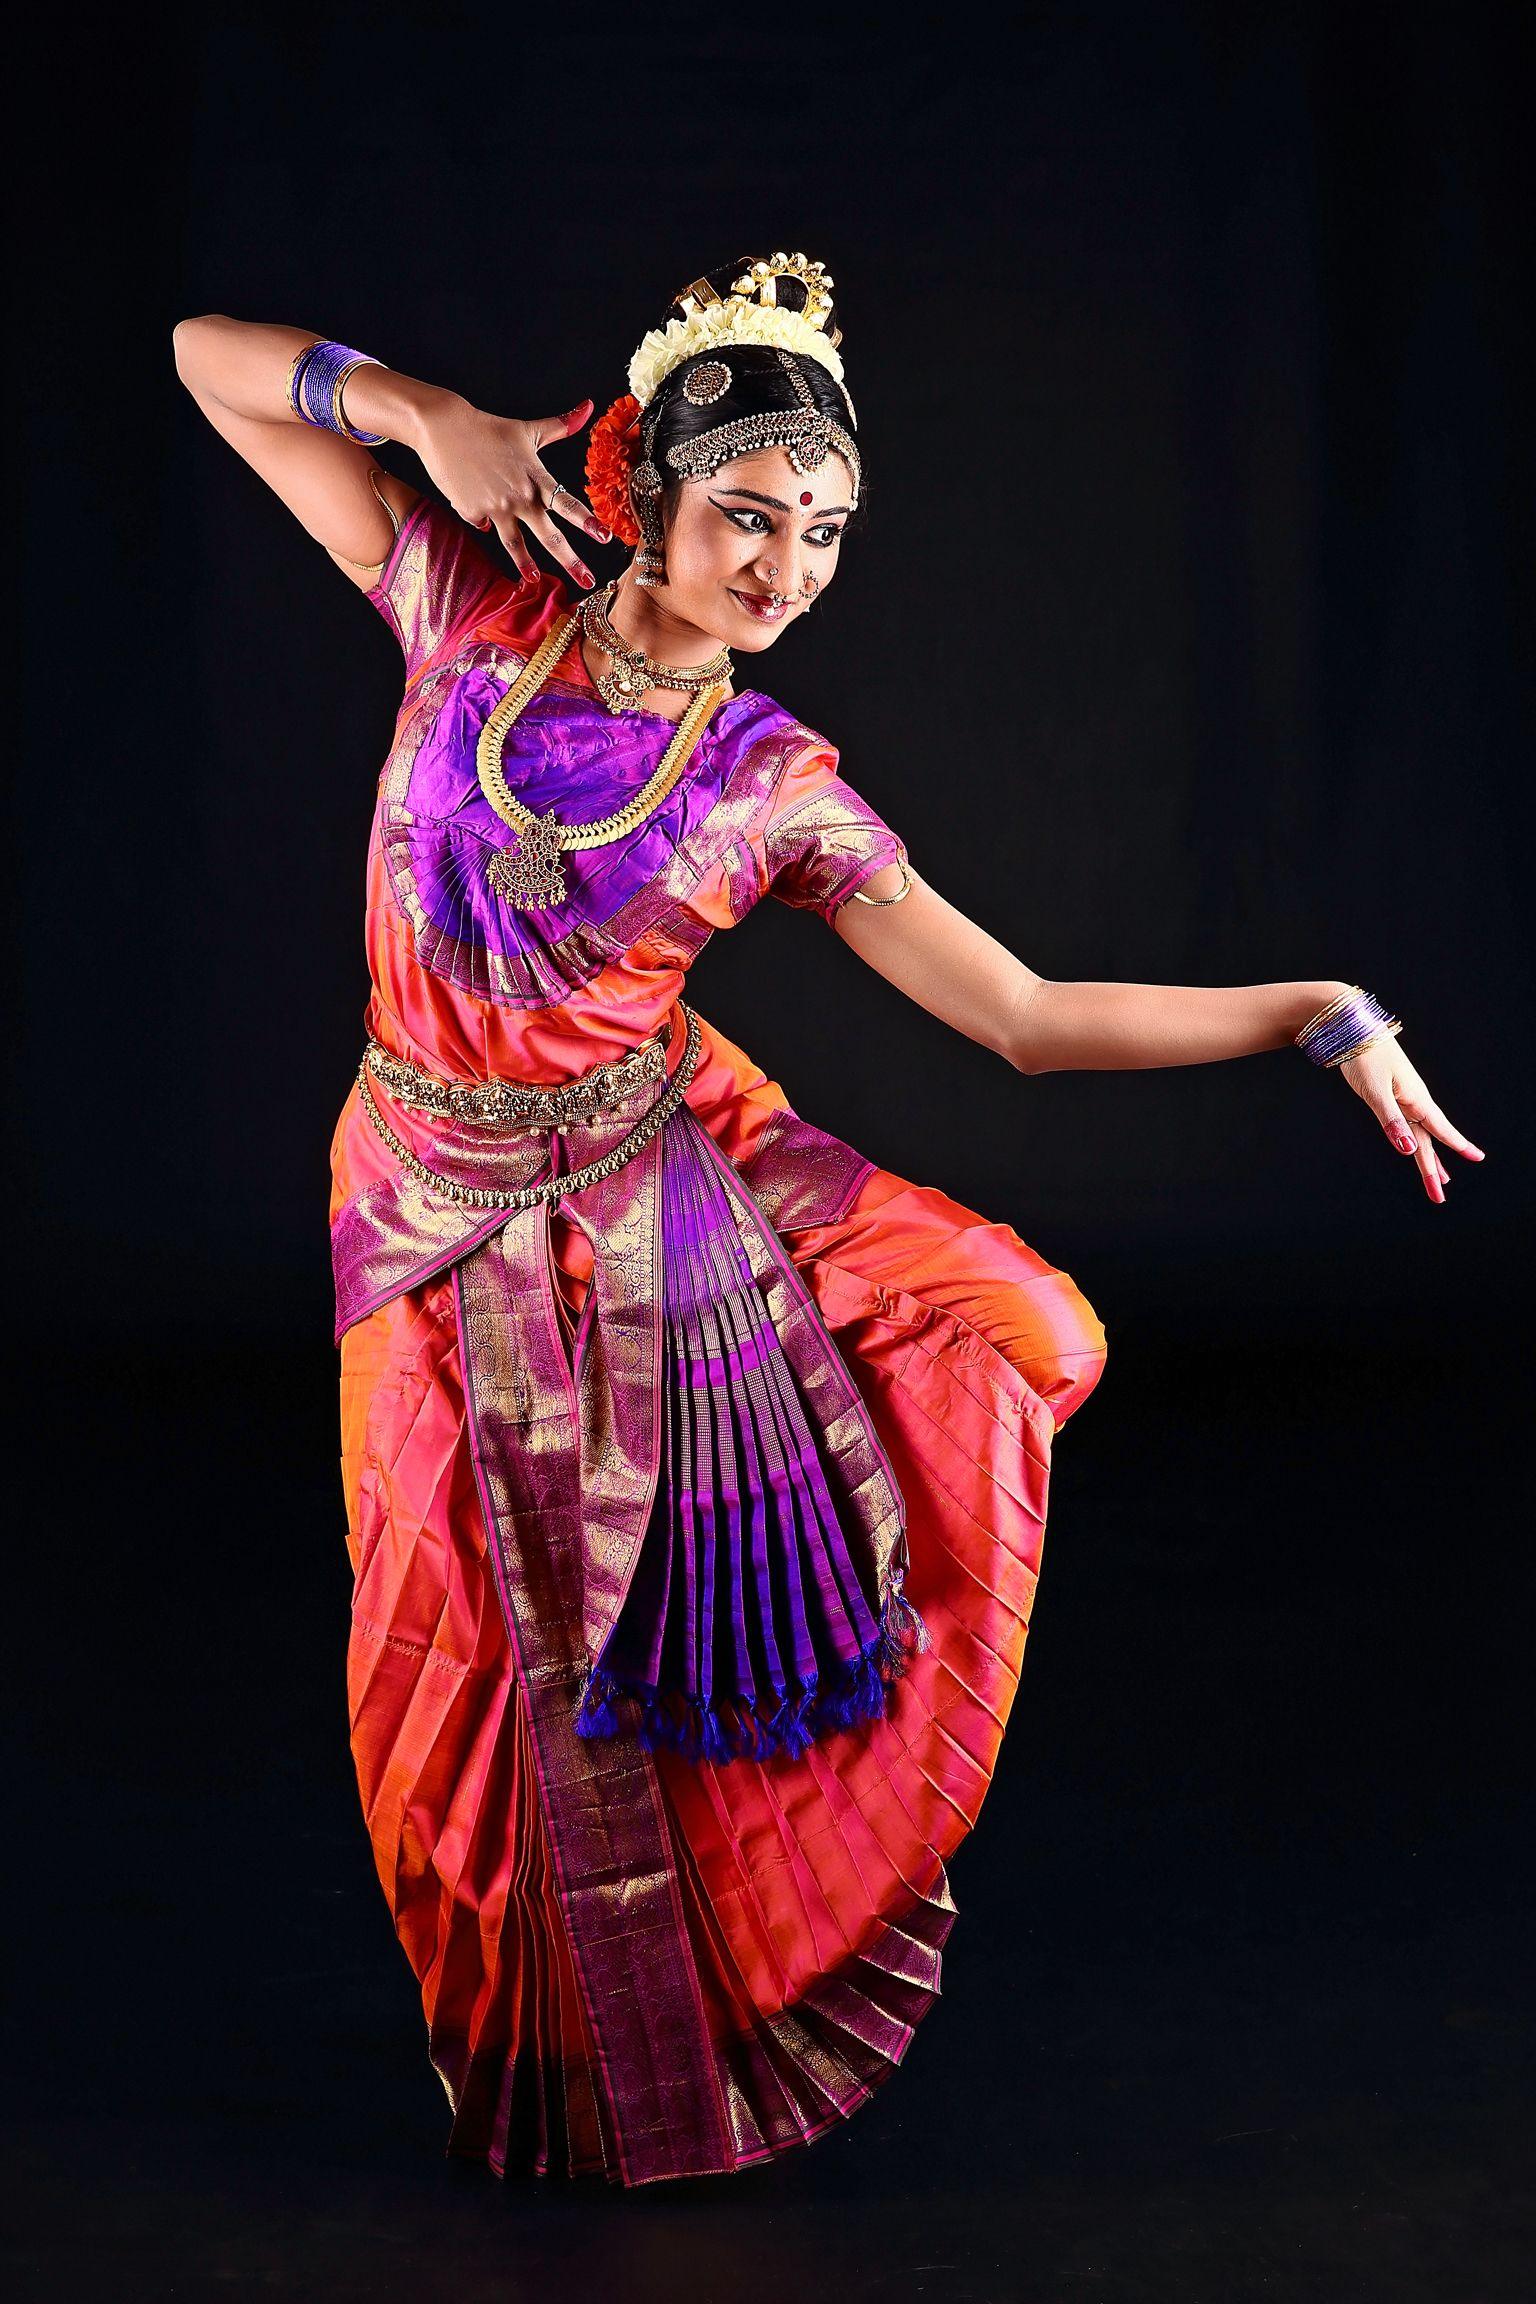 Shobana dance performance in bangalore dating